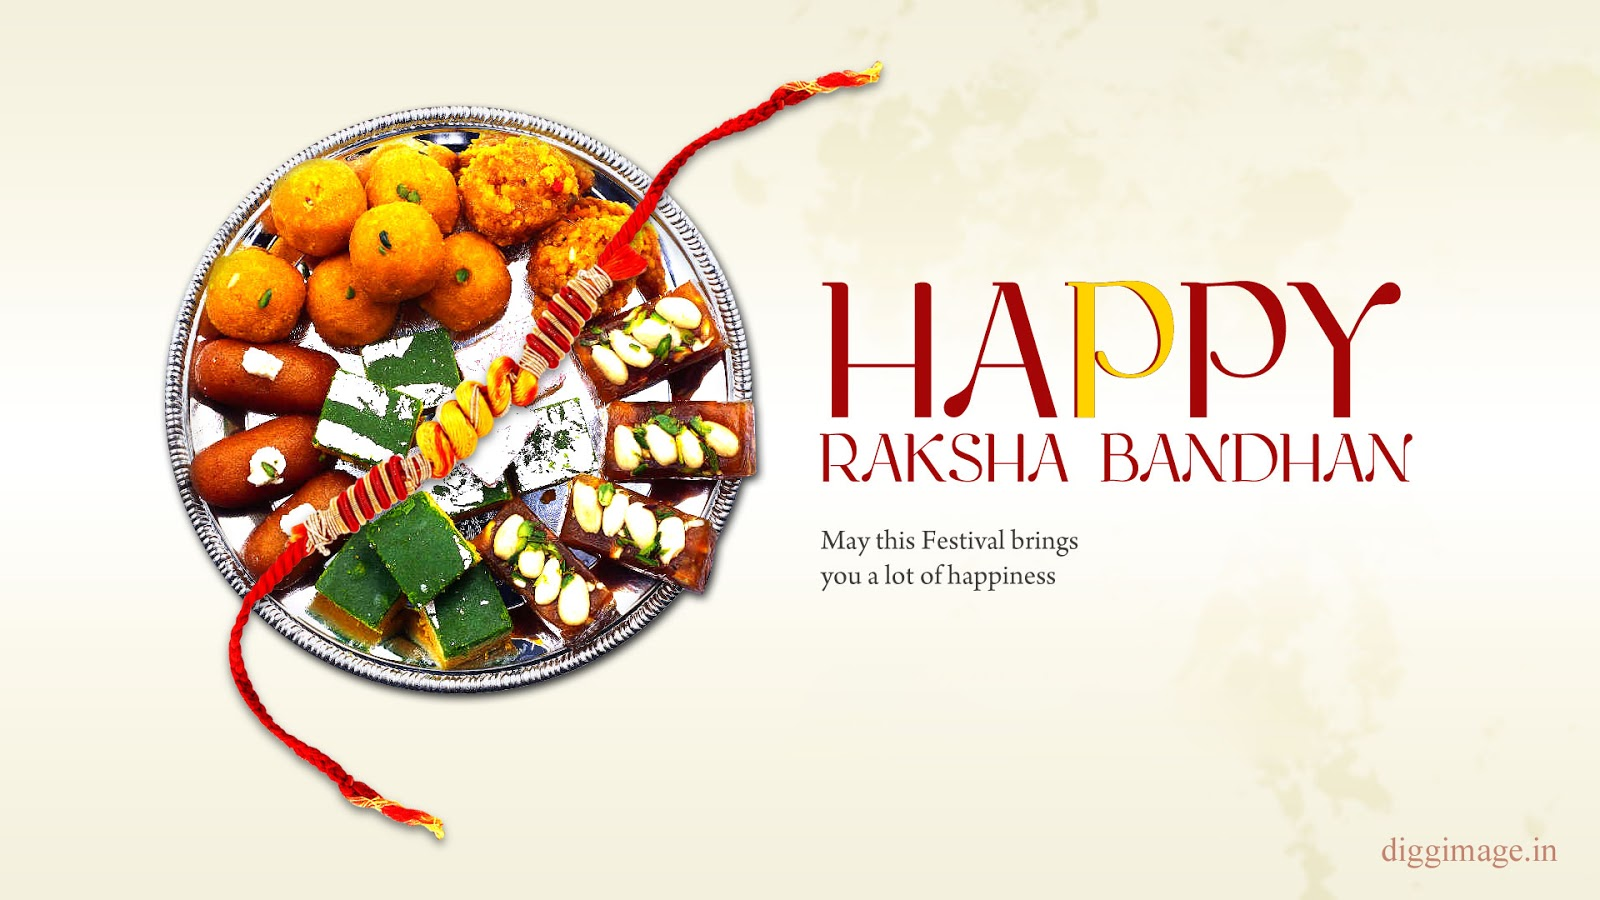 this festival brings you a lot a happiness happy raksha raksha bandhan raksha bandhan quotes raksha bandhan sms raksha bandhan essay raksha